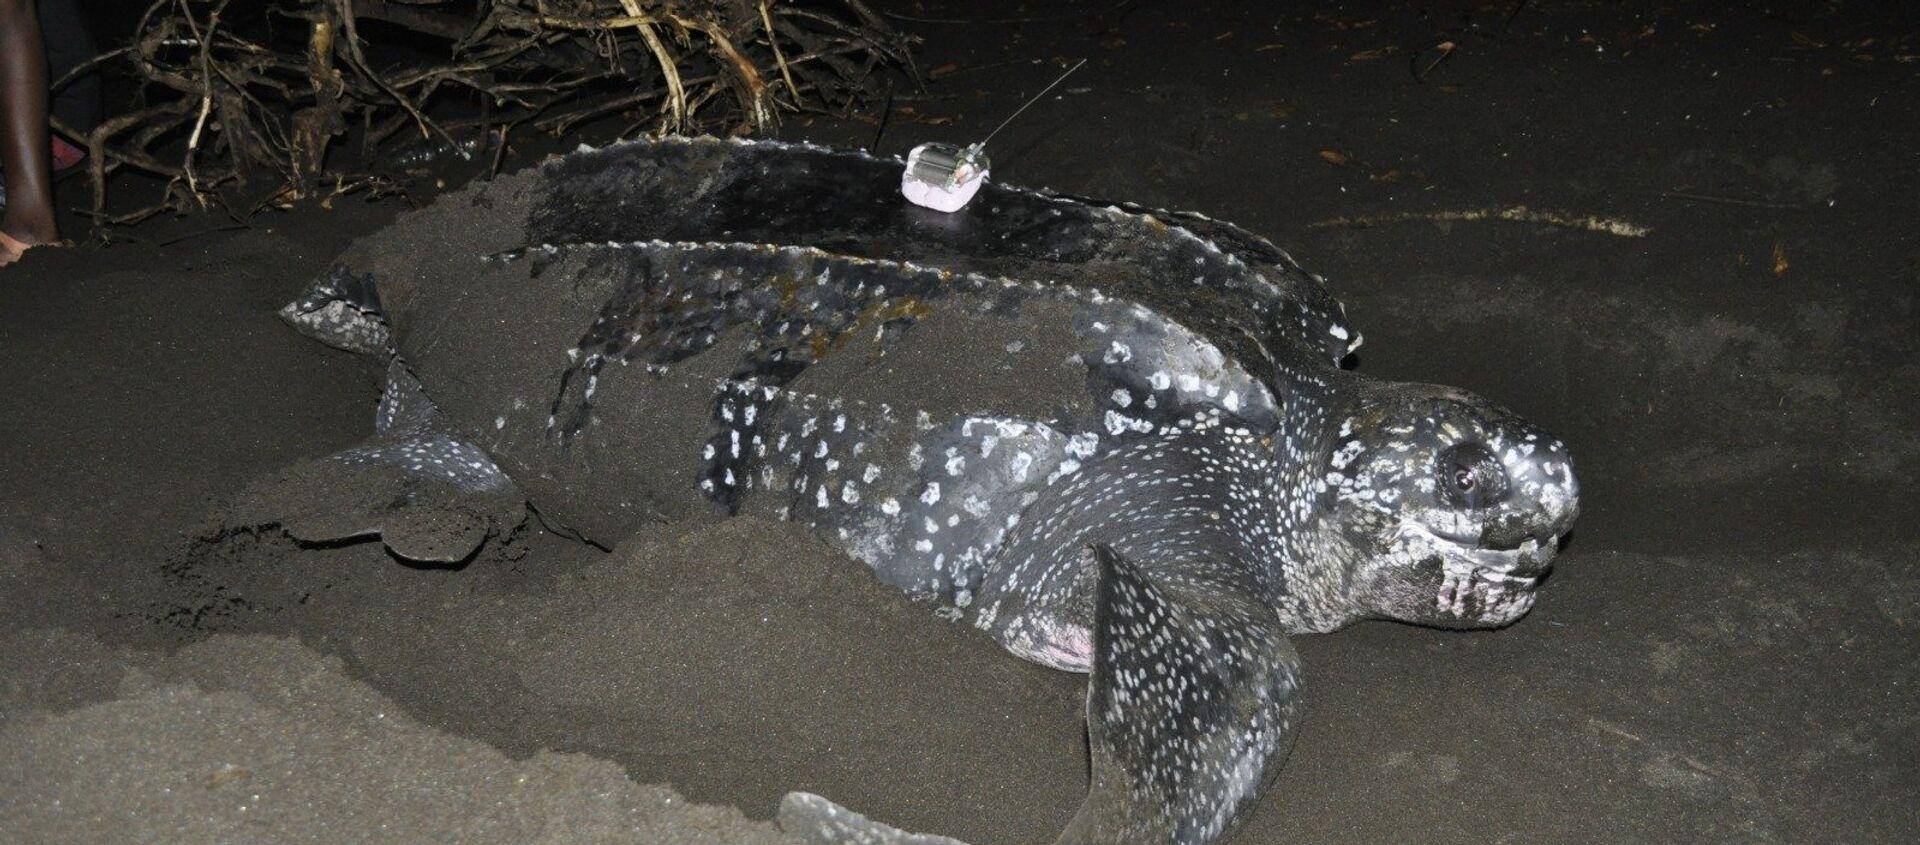 Una tortuga laúd siendo estudiada en la costa de Guinea Ecuatorial - Sputnik Mundo, 1920, 06.05.2019